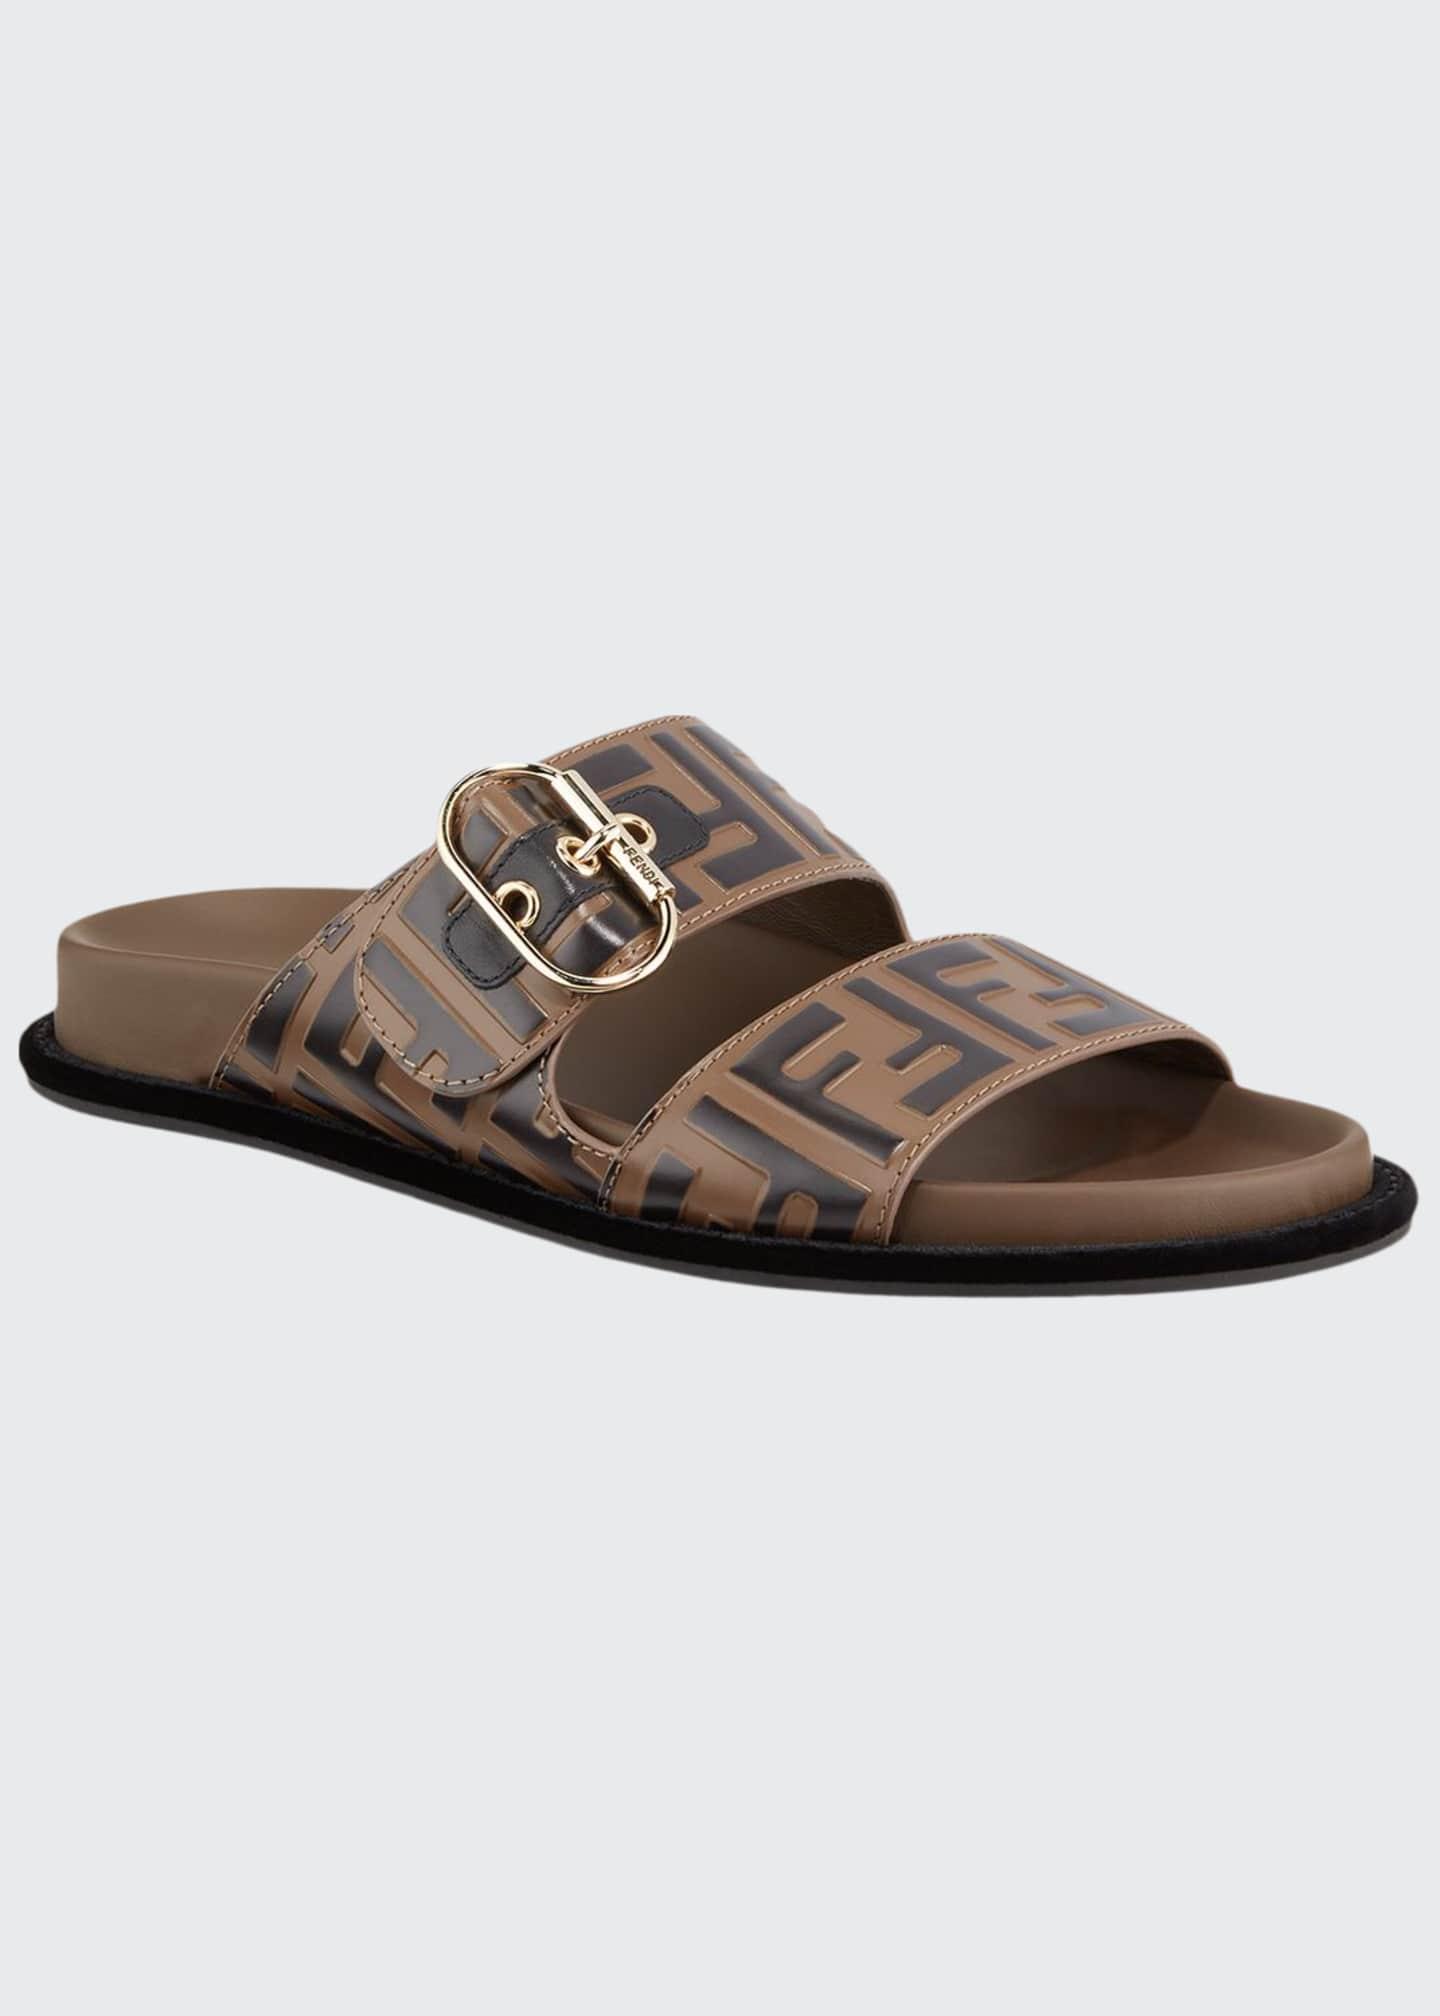 Fendi Leather FF Slide Sandals